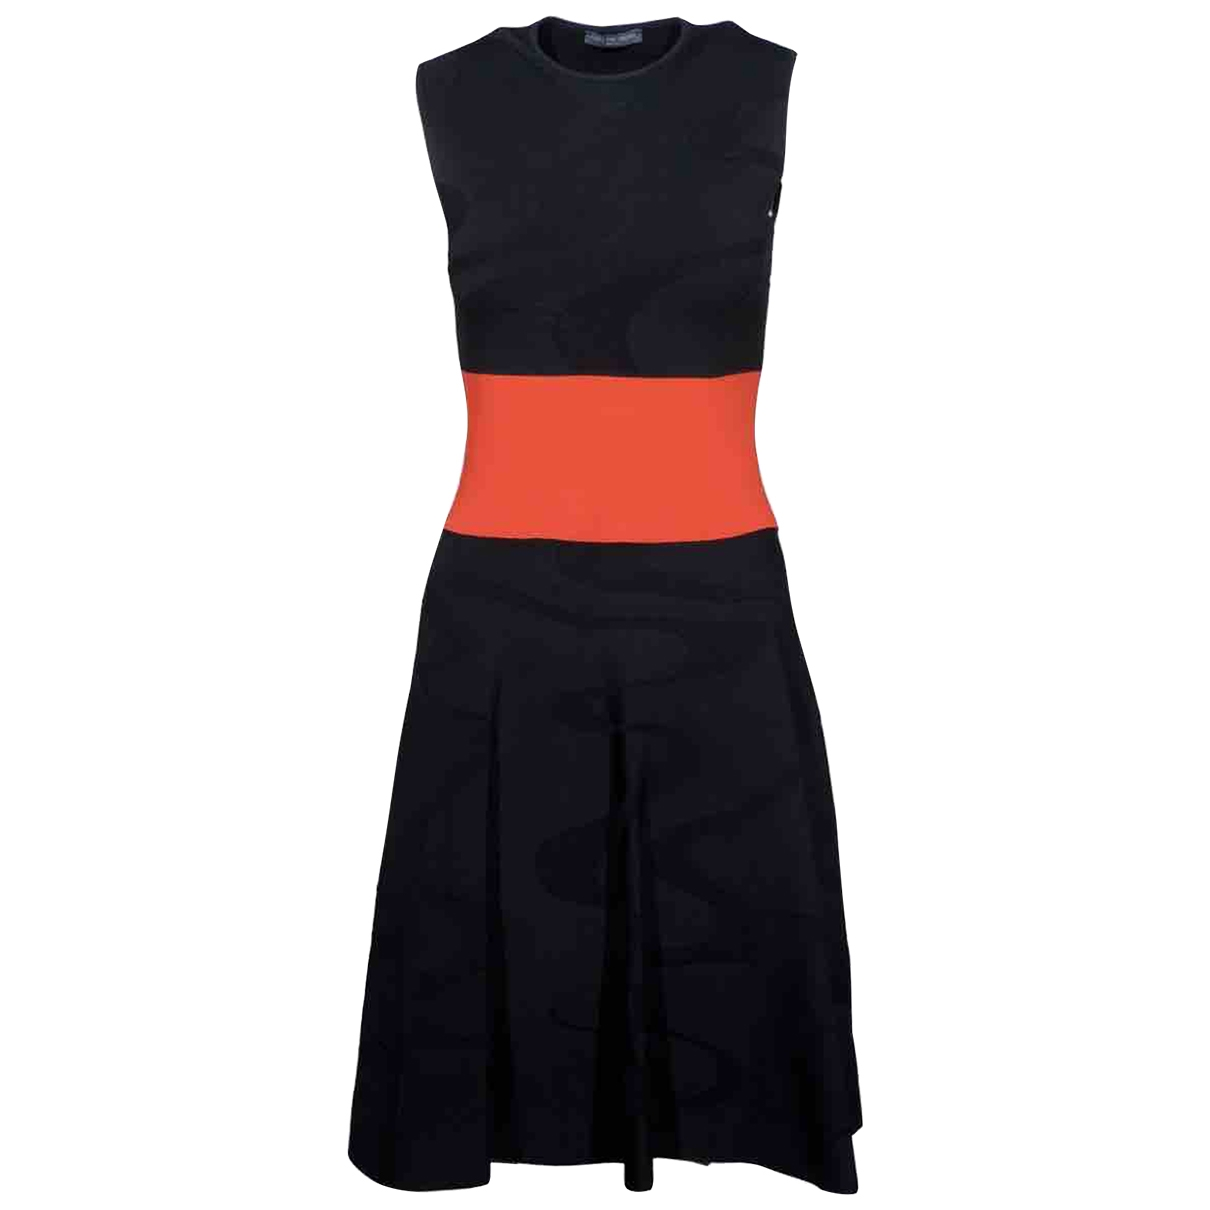 Alexander Mcqueen \N Black dress for Women M International